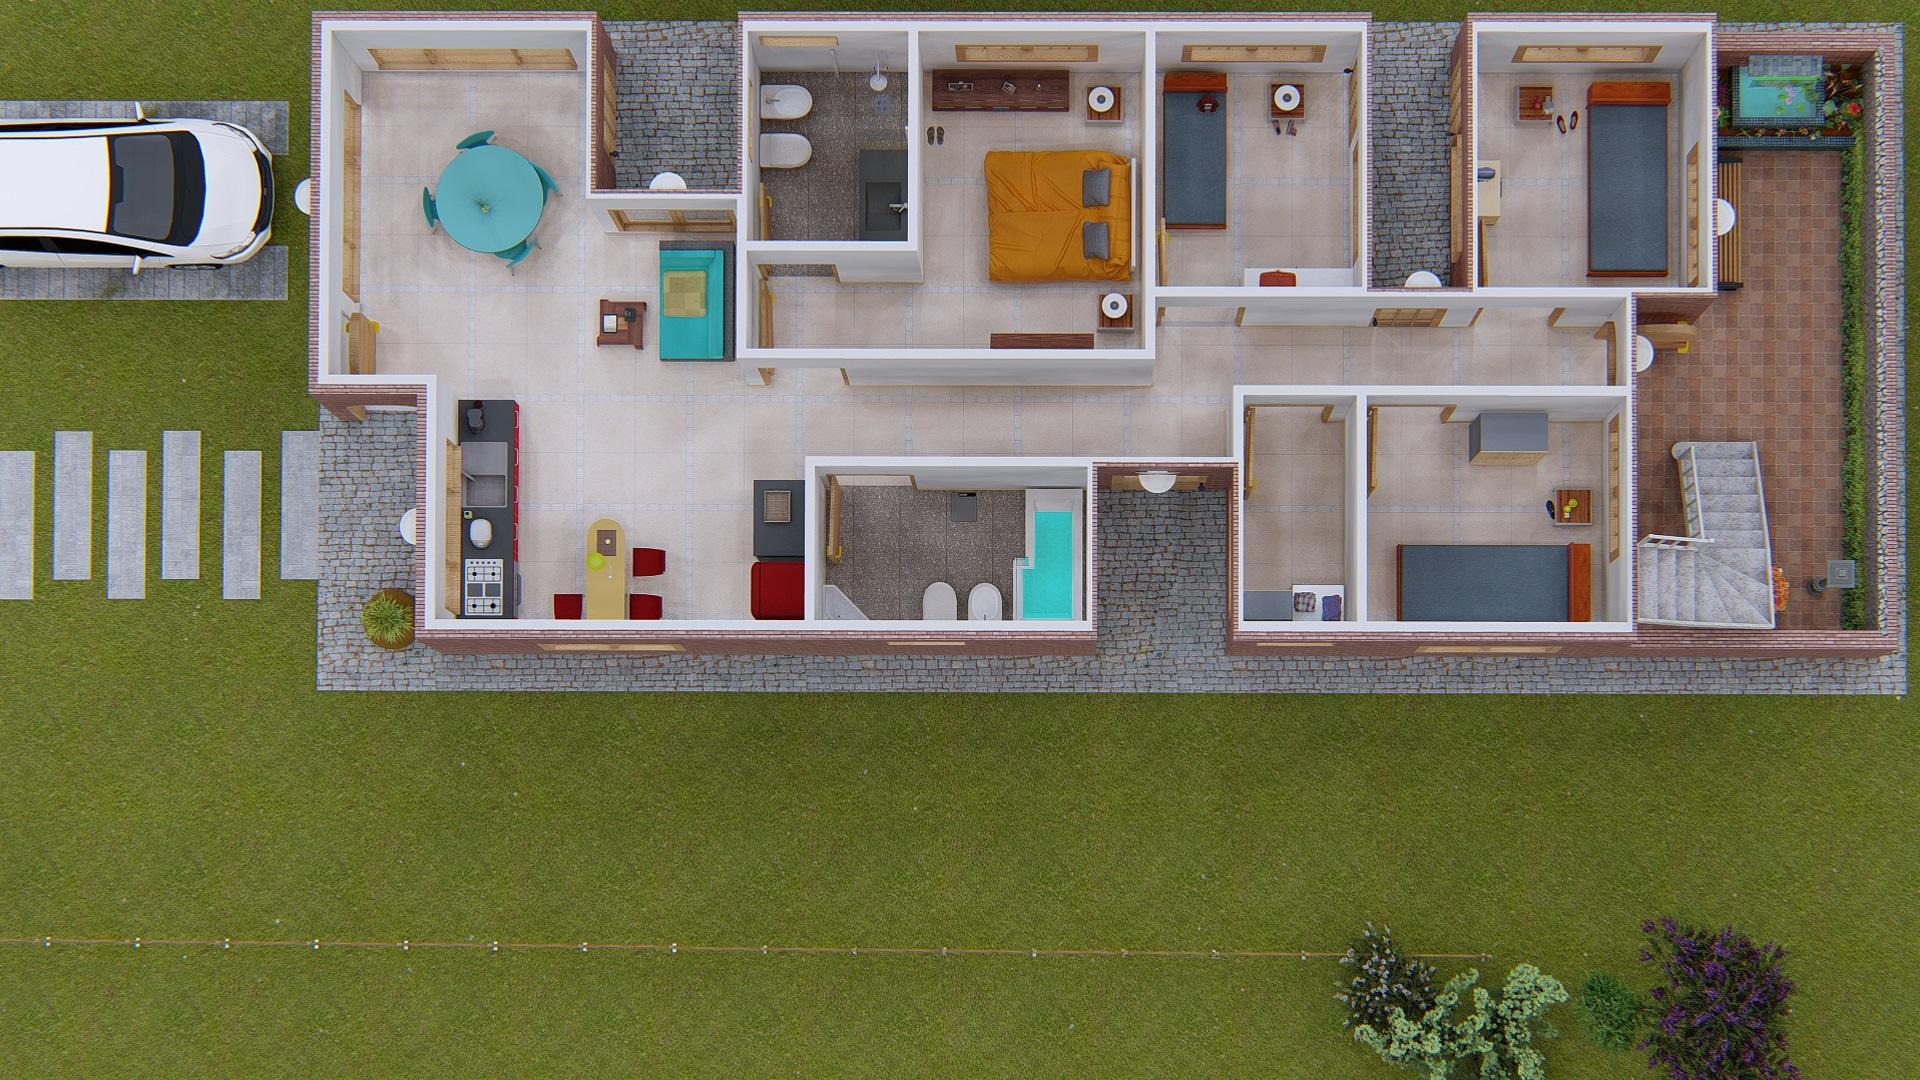 casa-angosta-6-5x16-5